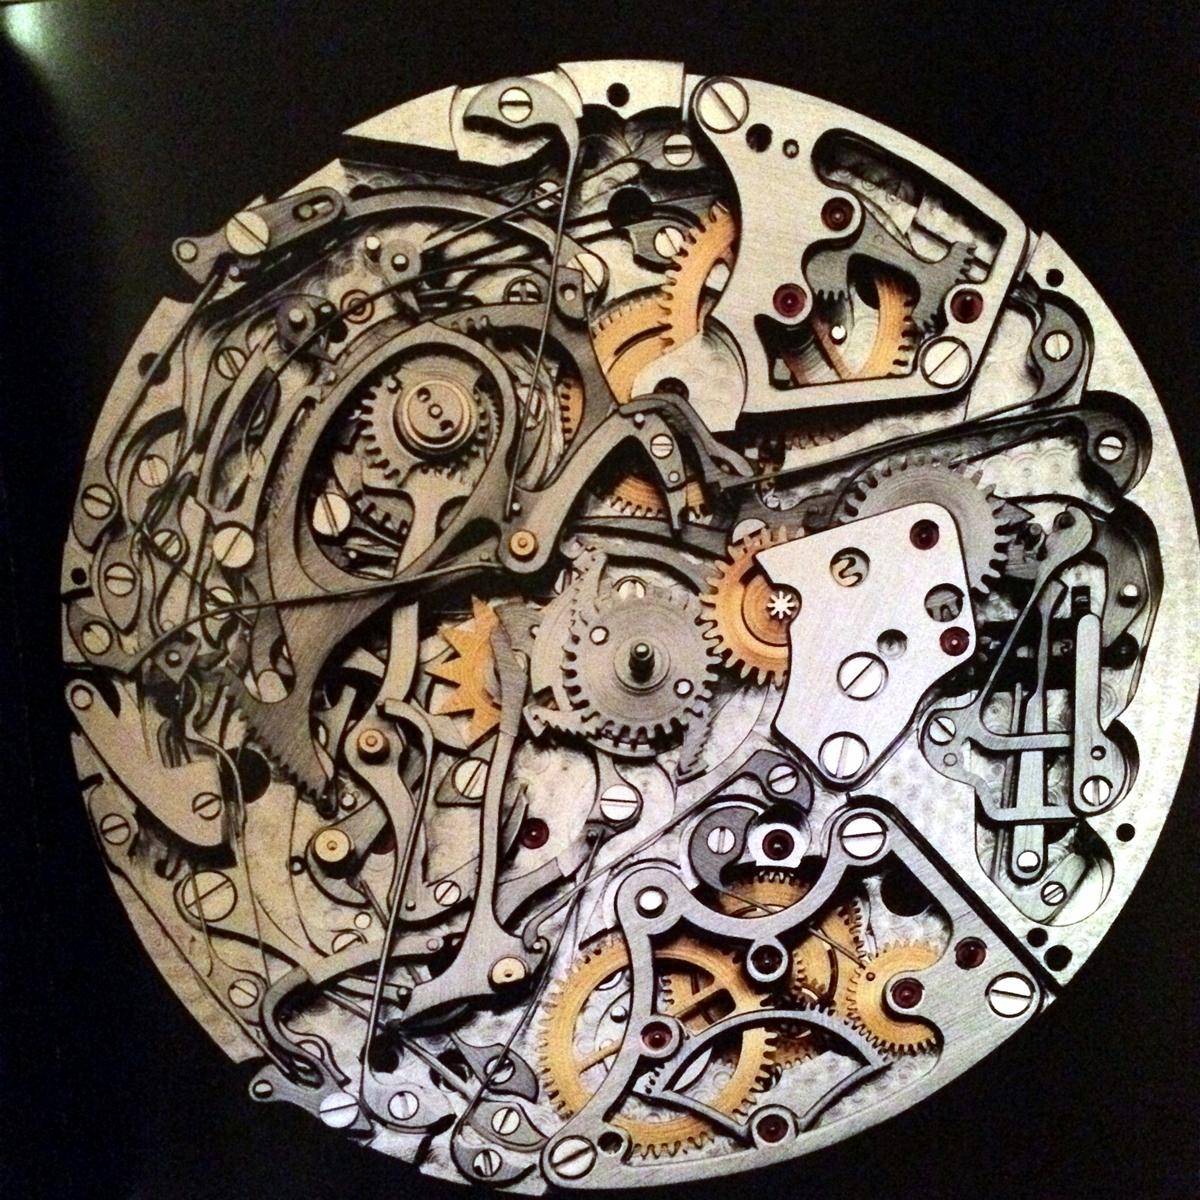 22 design z zegarkiem w ręku luksusowe zegarki SIHH Geneve lifestyle forelements blog